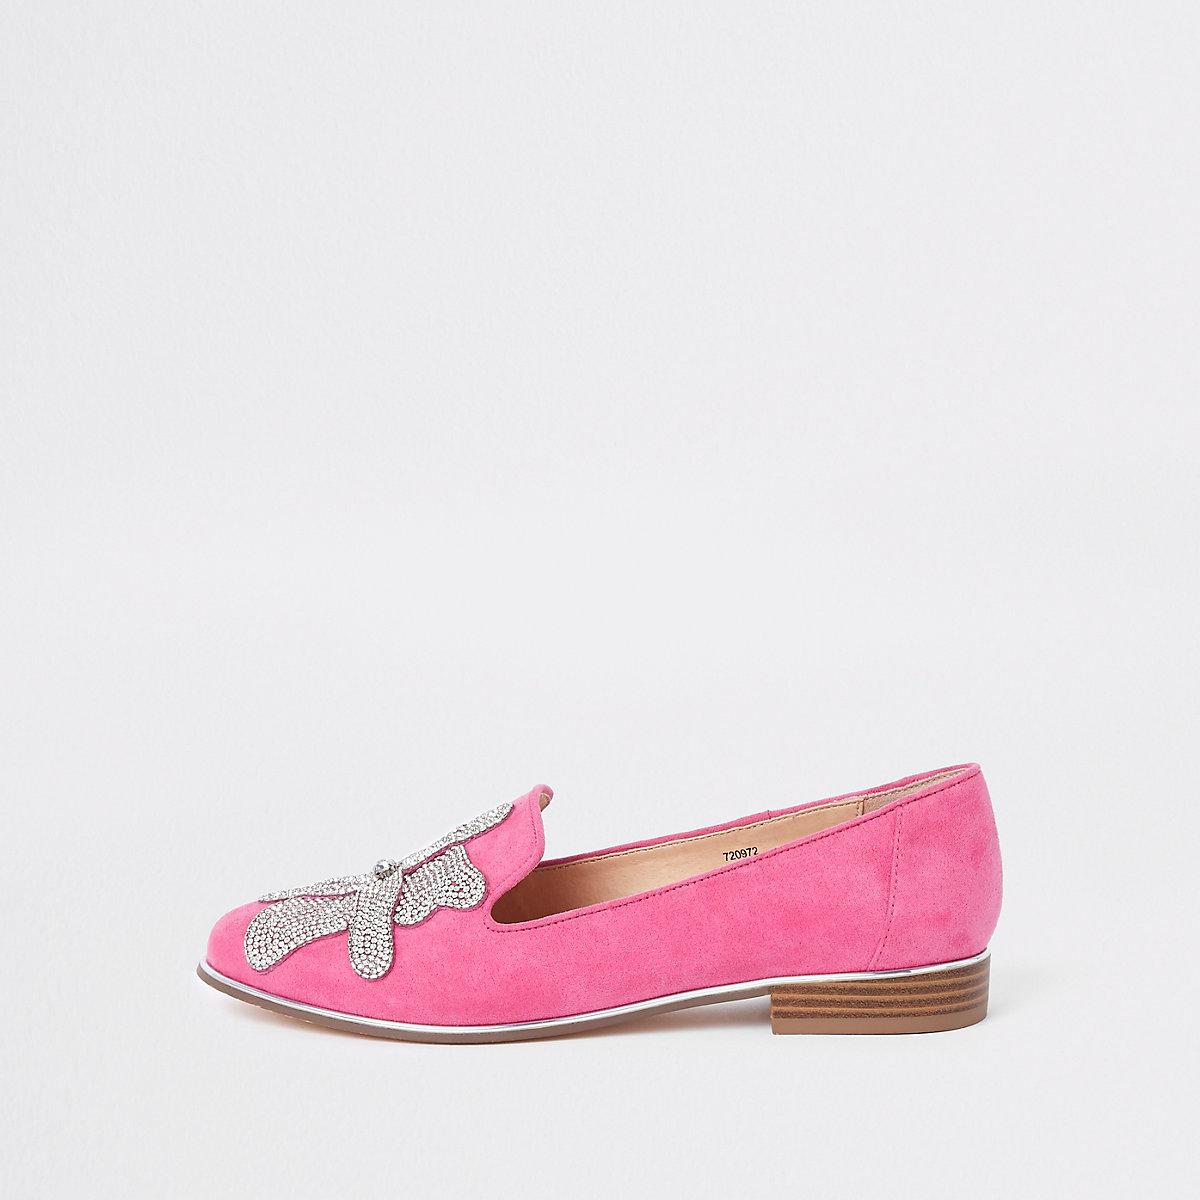 Pink floral diamante embellished loafers